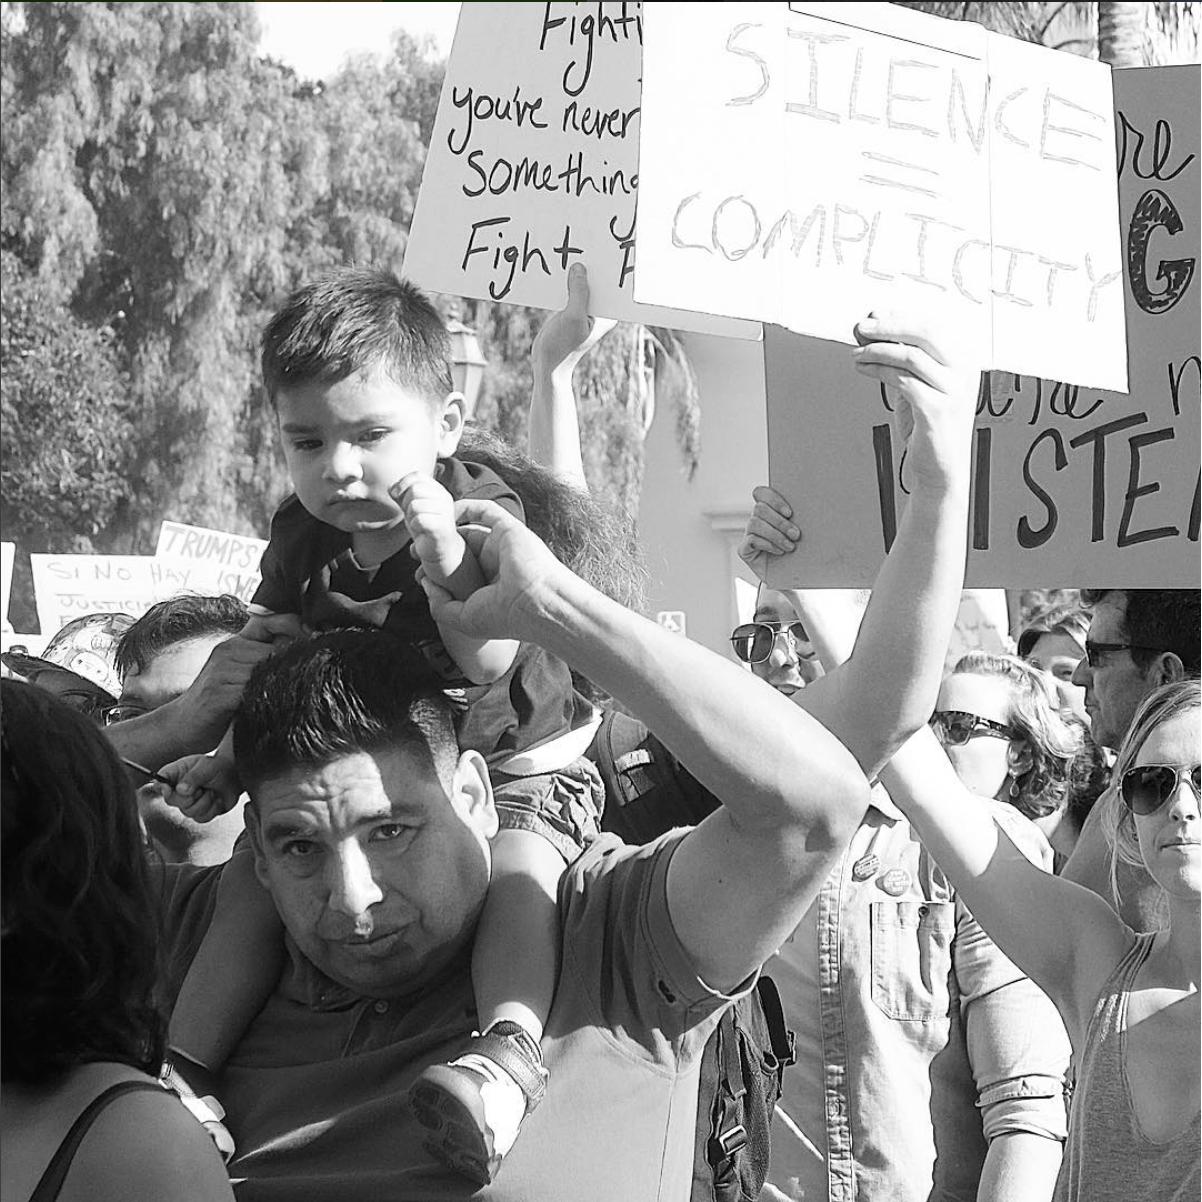 Santa Barbara, CA. Protestors march in solidarity against Trump in downtown SB. #SnapshotLives  #fujixt1